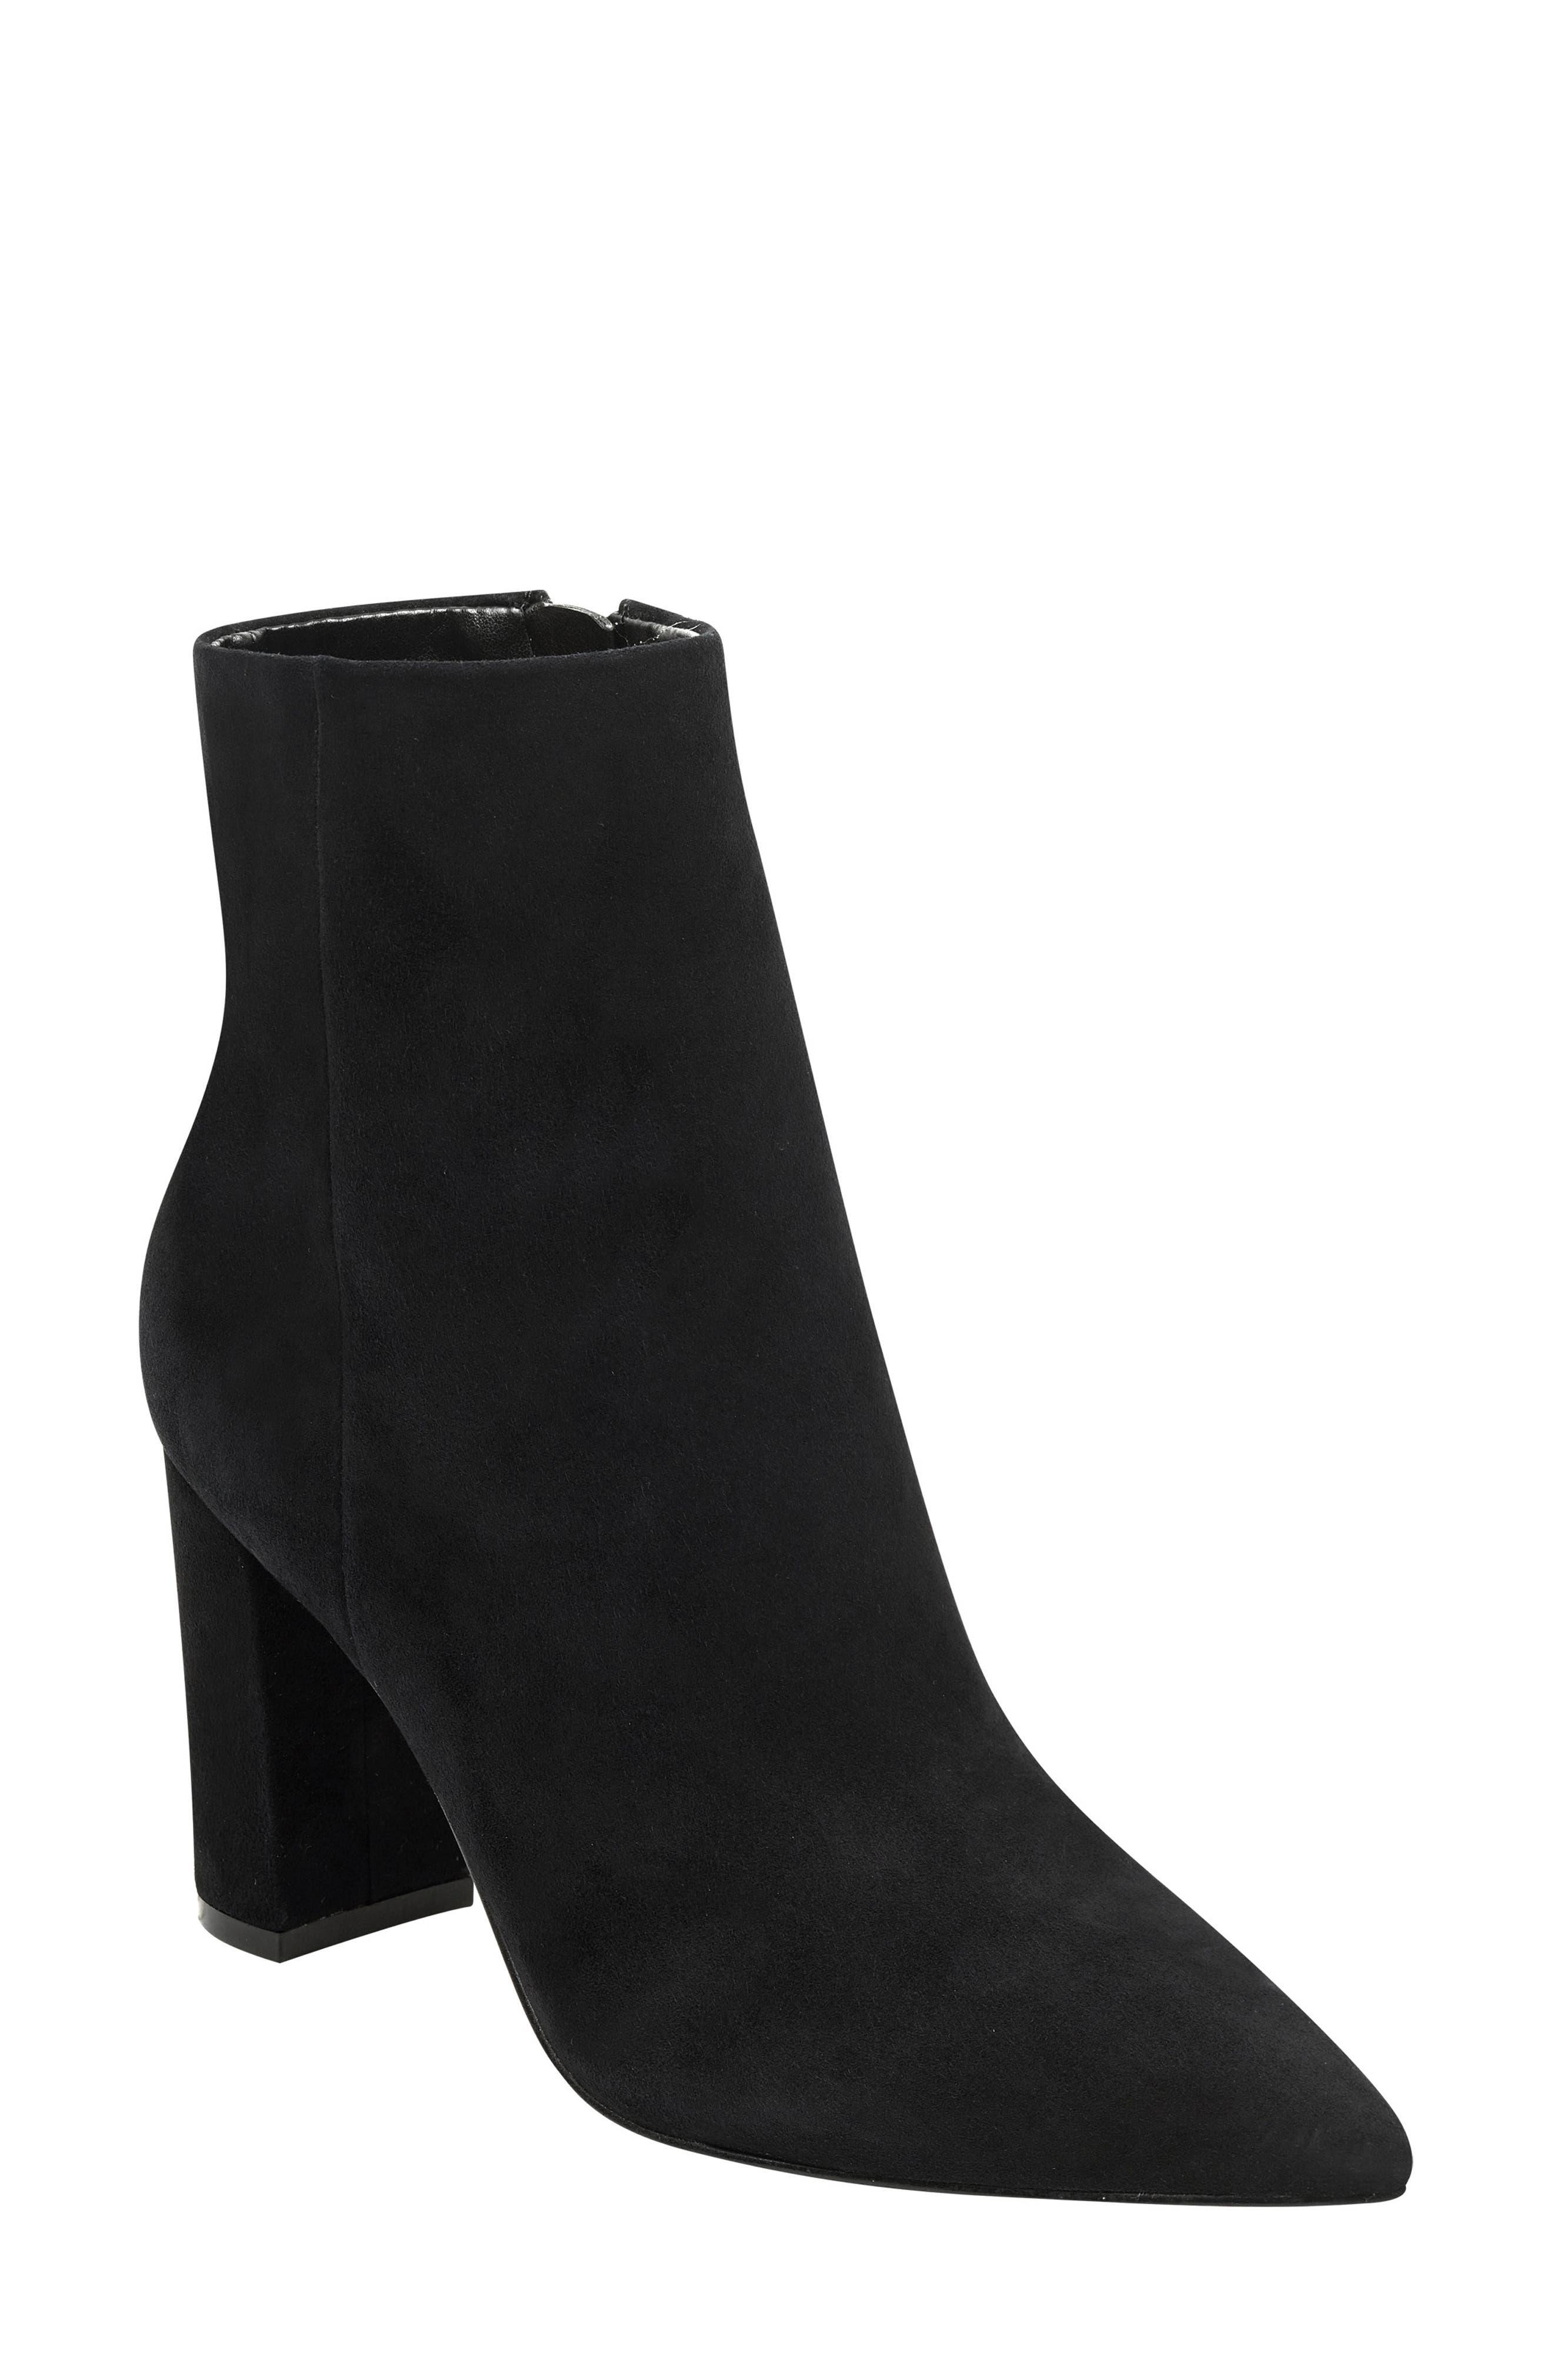 Marc Fisher Ltd. Ulani Pointy Toe Bootie- Black